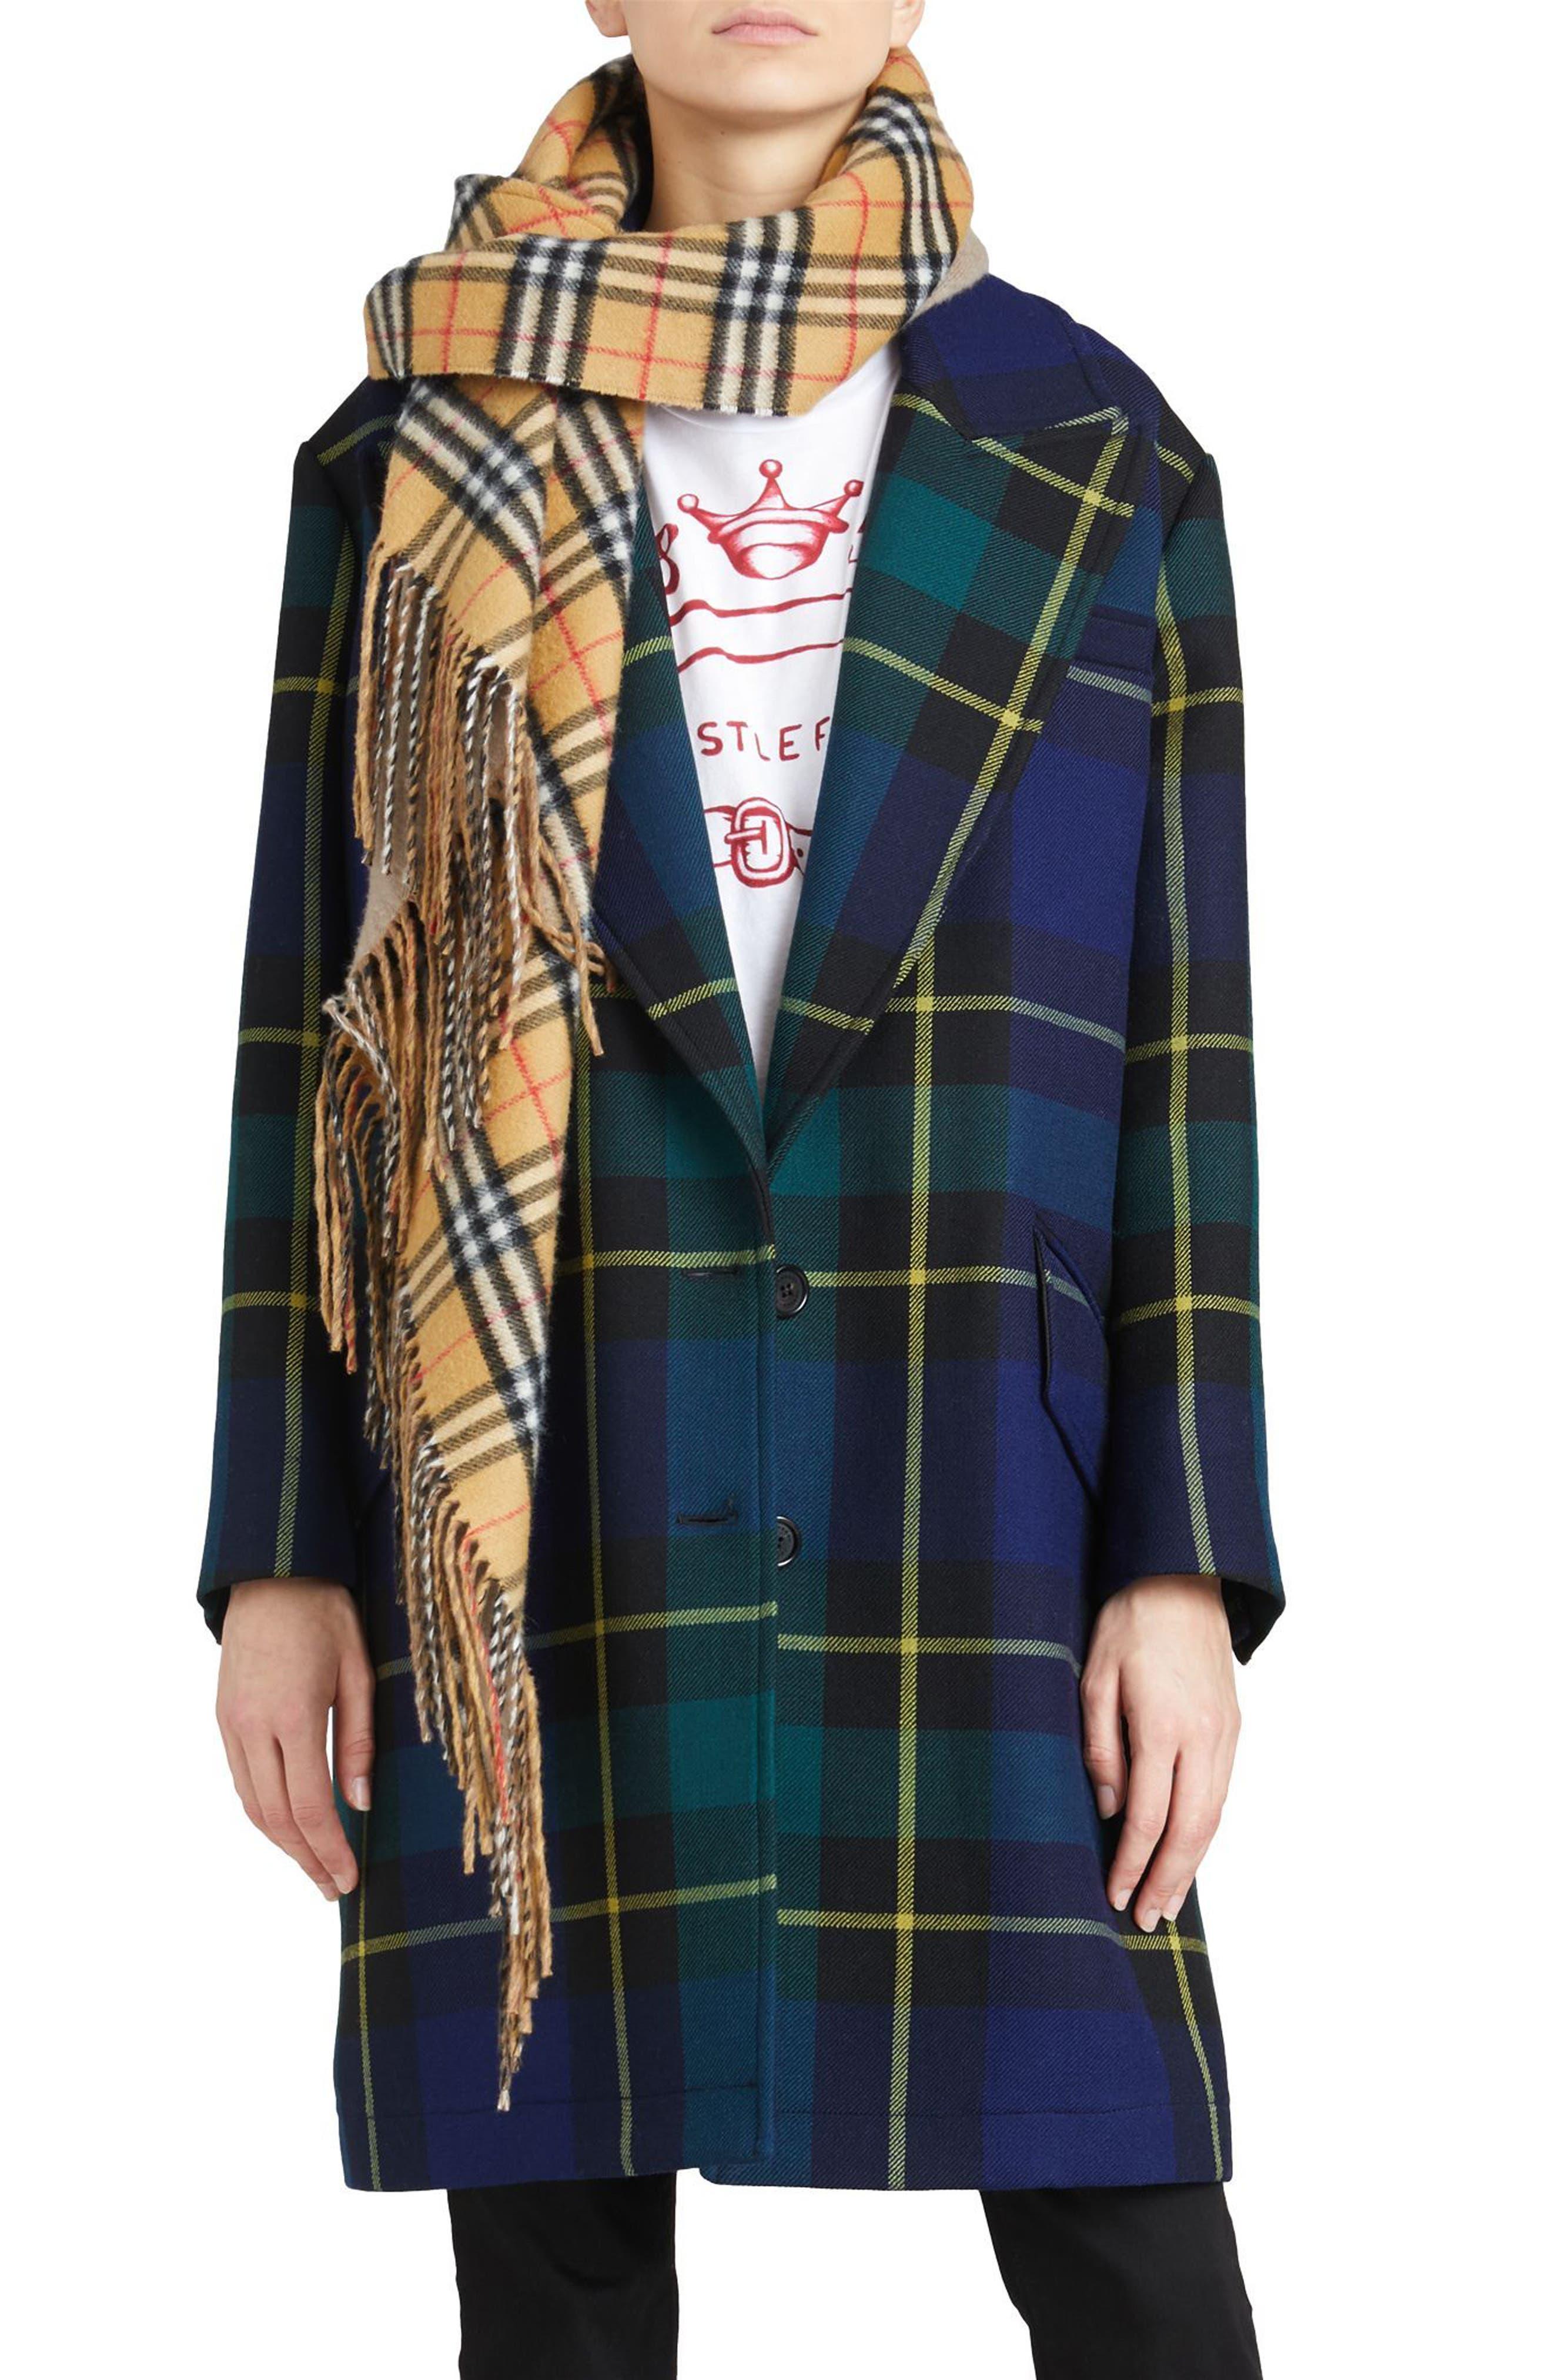 Strathyre Tartan Plaid Wool Blend Coat,                         Main,                         color, Pine Green